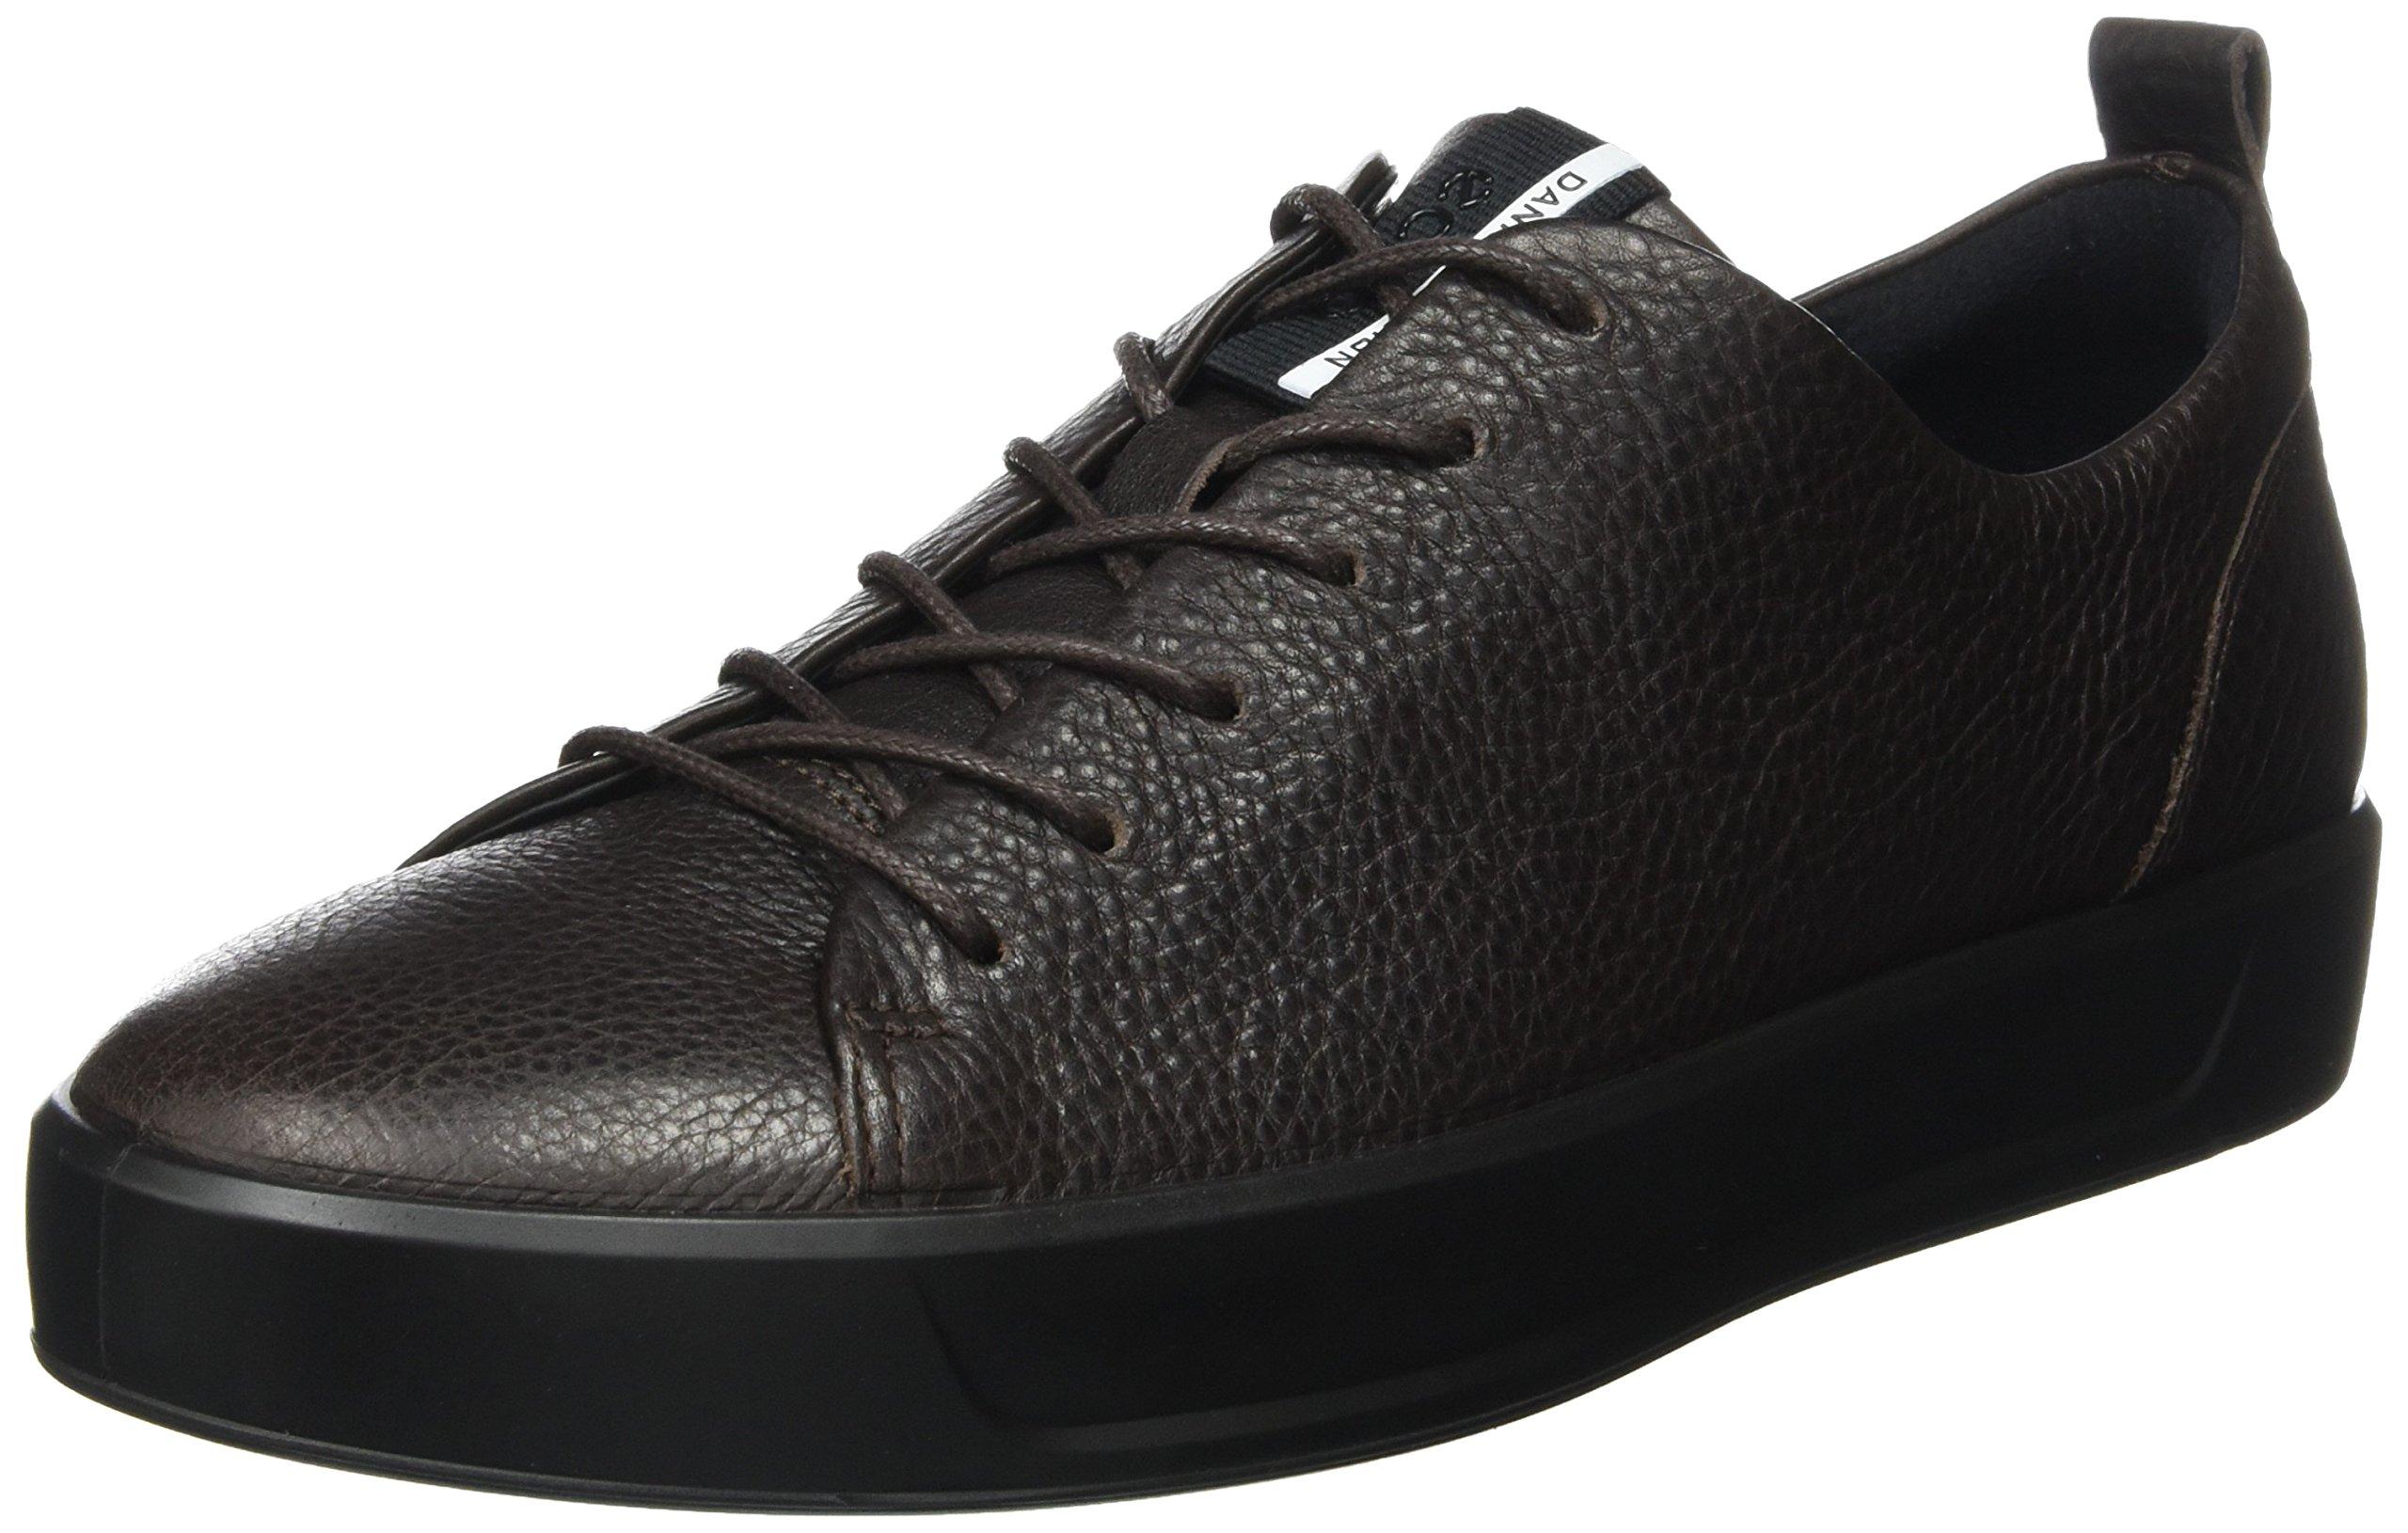 ECCO Men's Soft 8 Tie Fashion Sneaker, Coffee/Black, 45 M EU/11-11.5 D(M) US